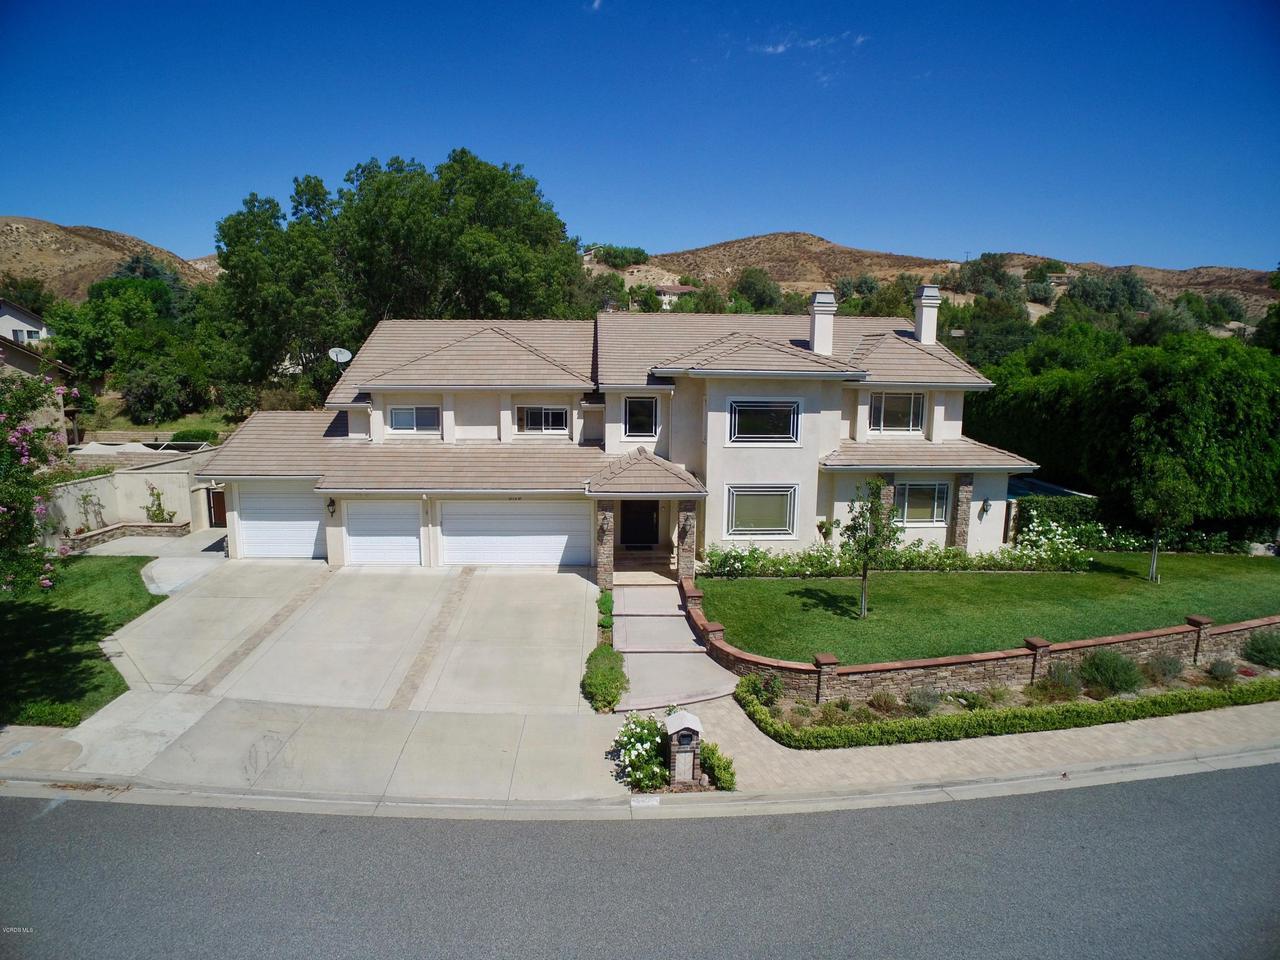 Photo of 3179 BIANCA CIRCLE, Simi Valley, CA 93063